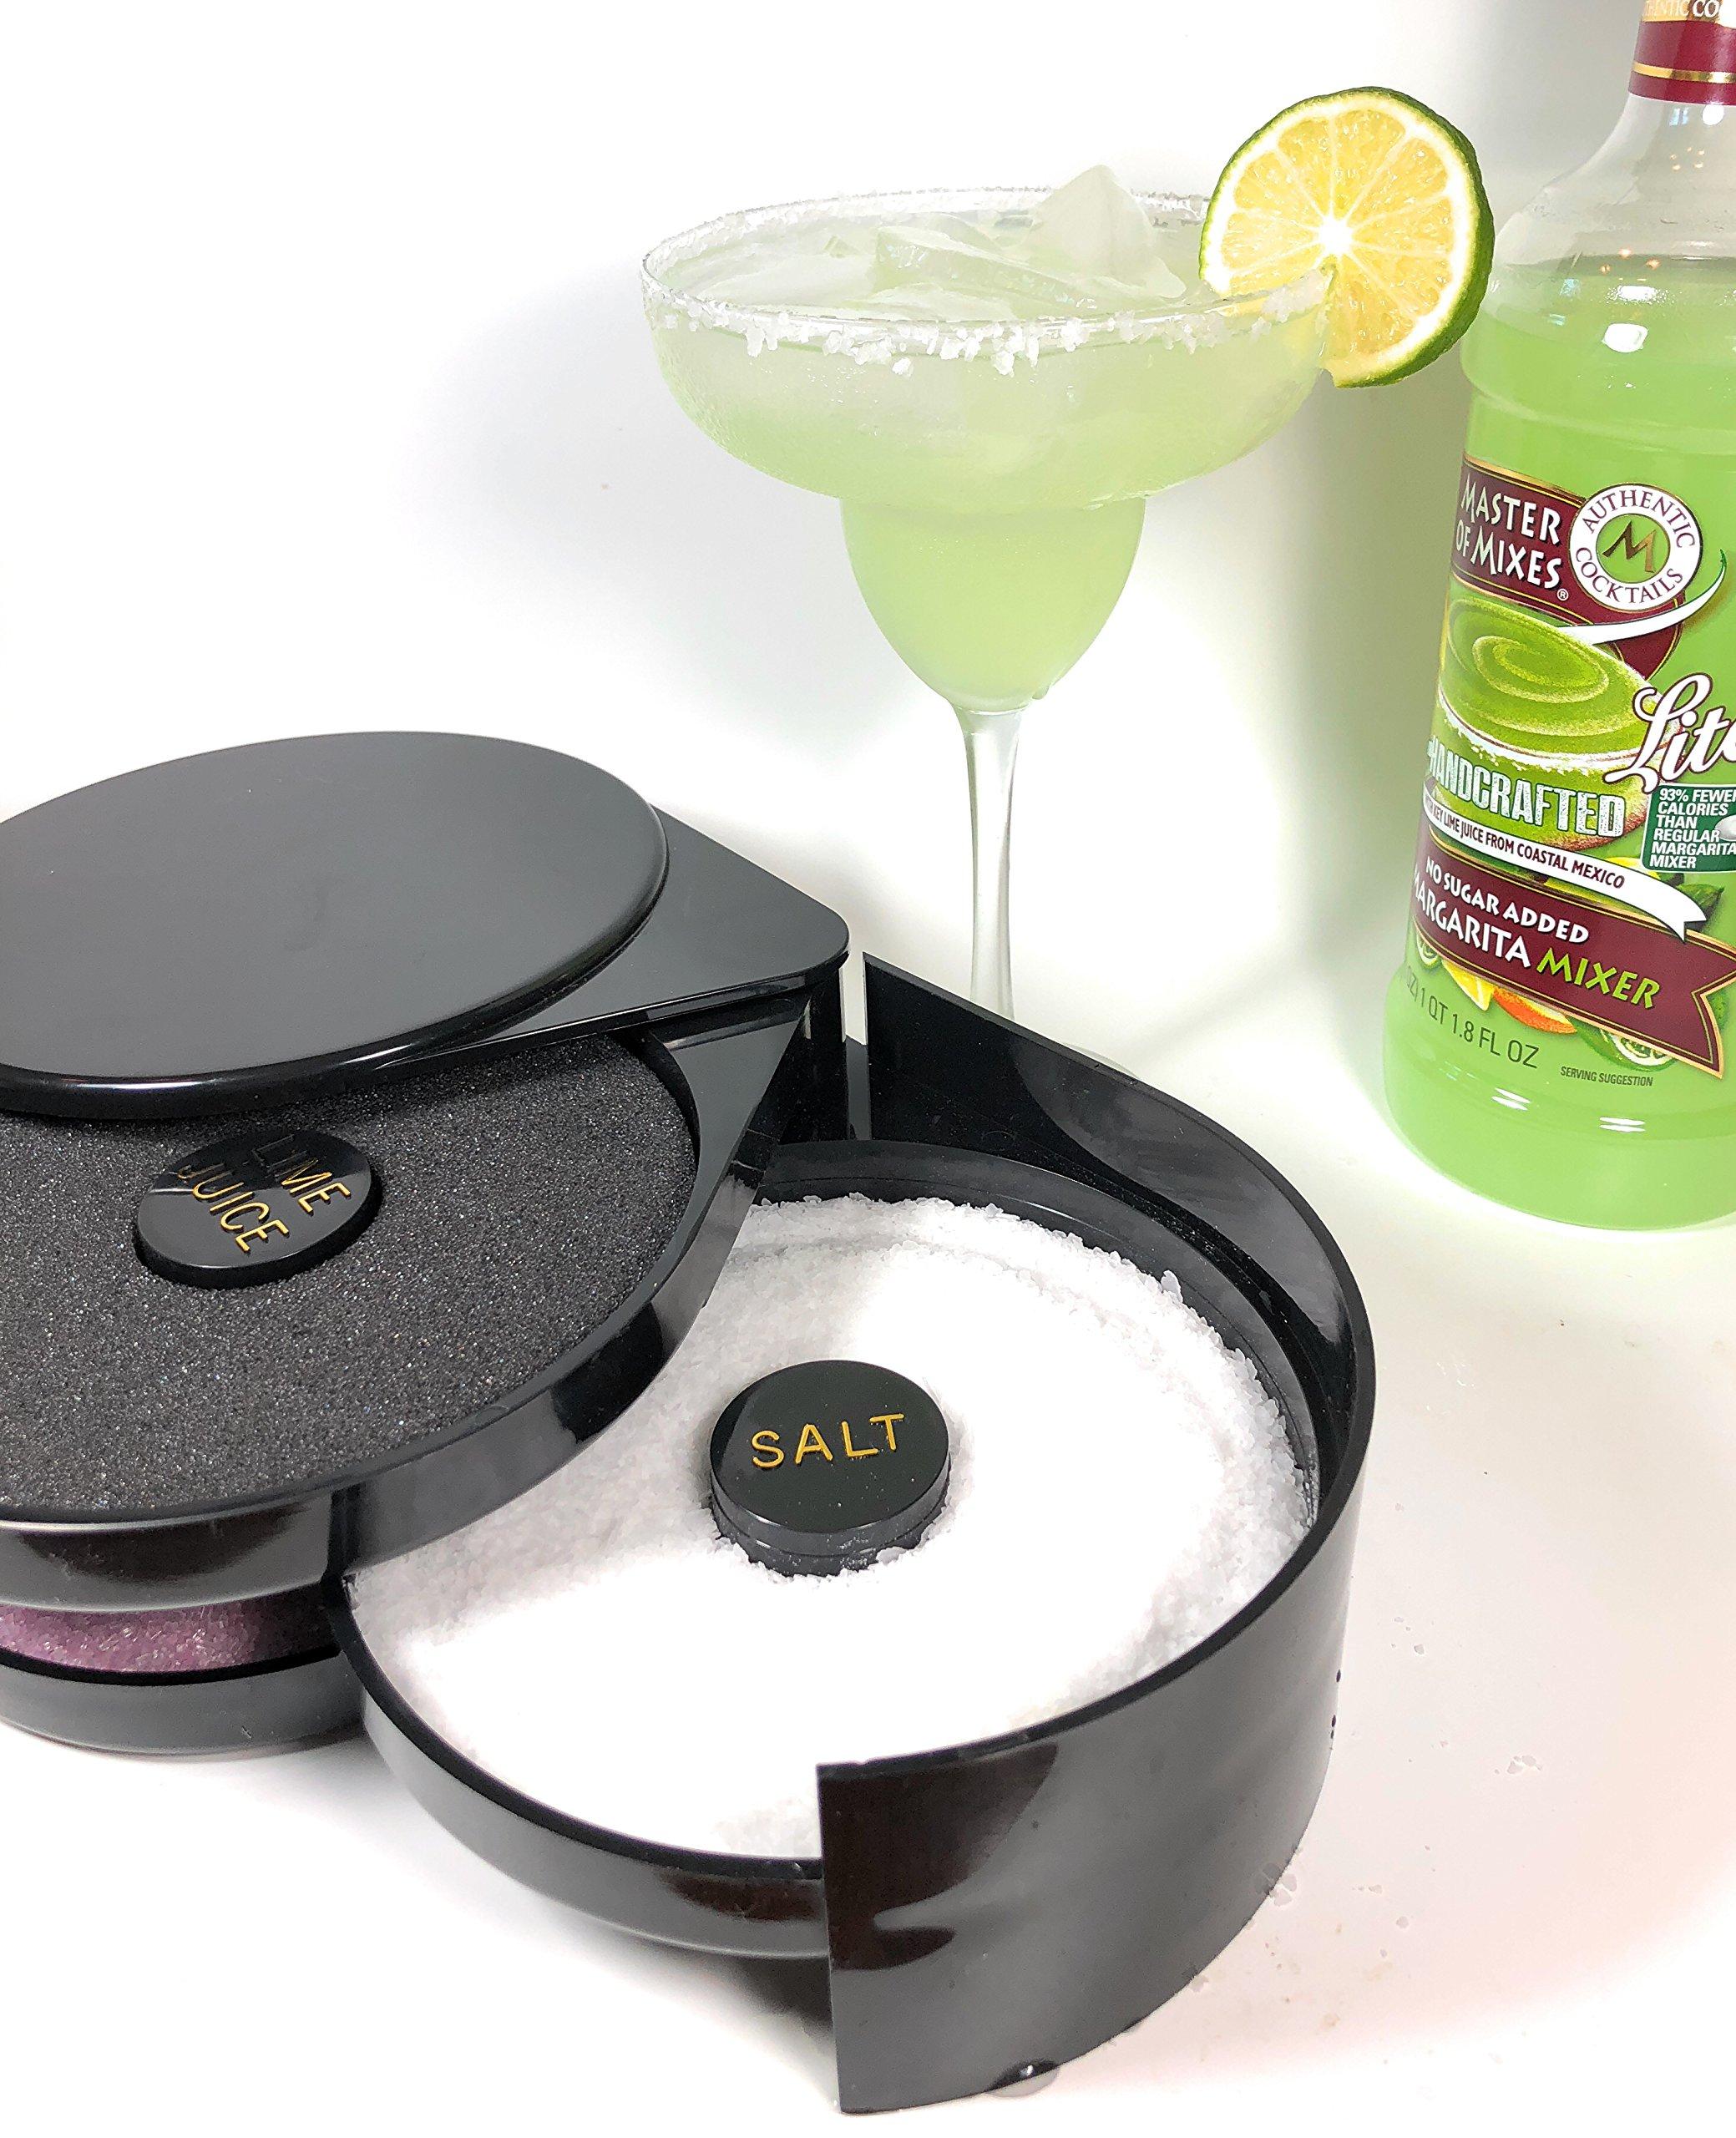 Margarita Salt Glass Rimmer BUNDLE - Bar Quality Rimmer, 8oz Margarita Salt Container, 3 Replacement Sponges | Perfect for Margaritas & Cocktails | 3-Tier Rotating Trays Salt Sugar Lime Juice SUMMIT by SUMMIT Salt Rimmer Bundle (Image #6)